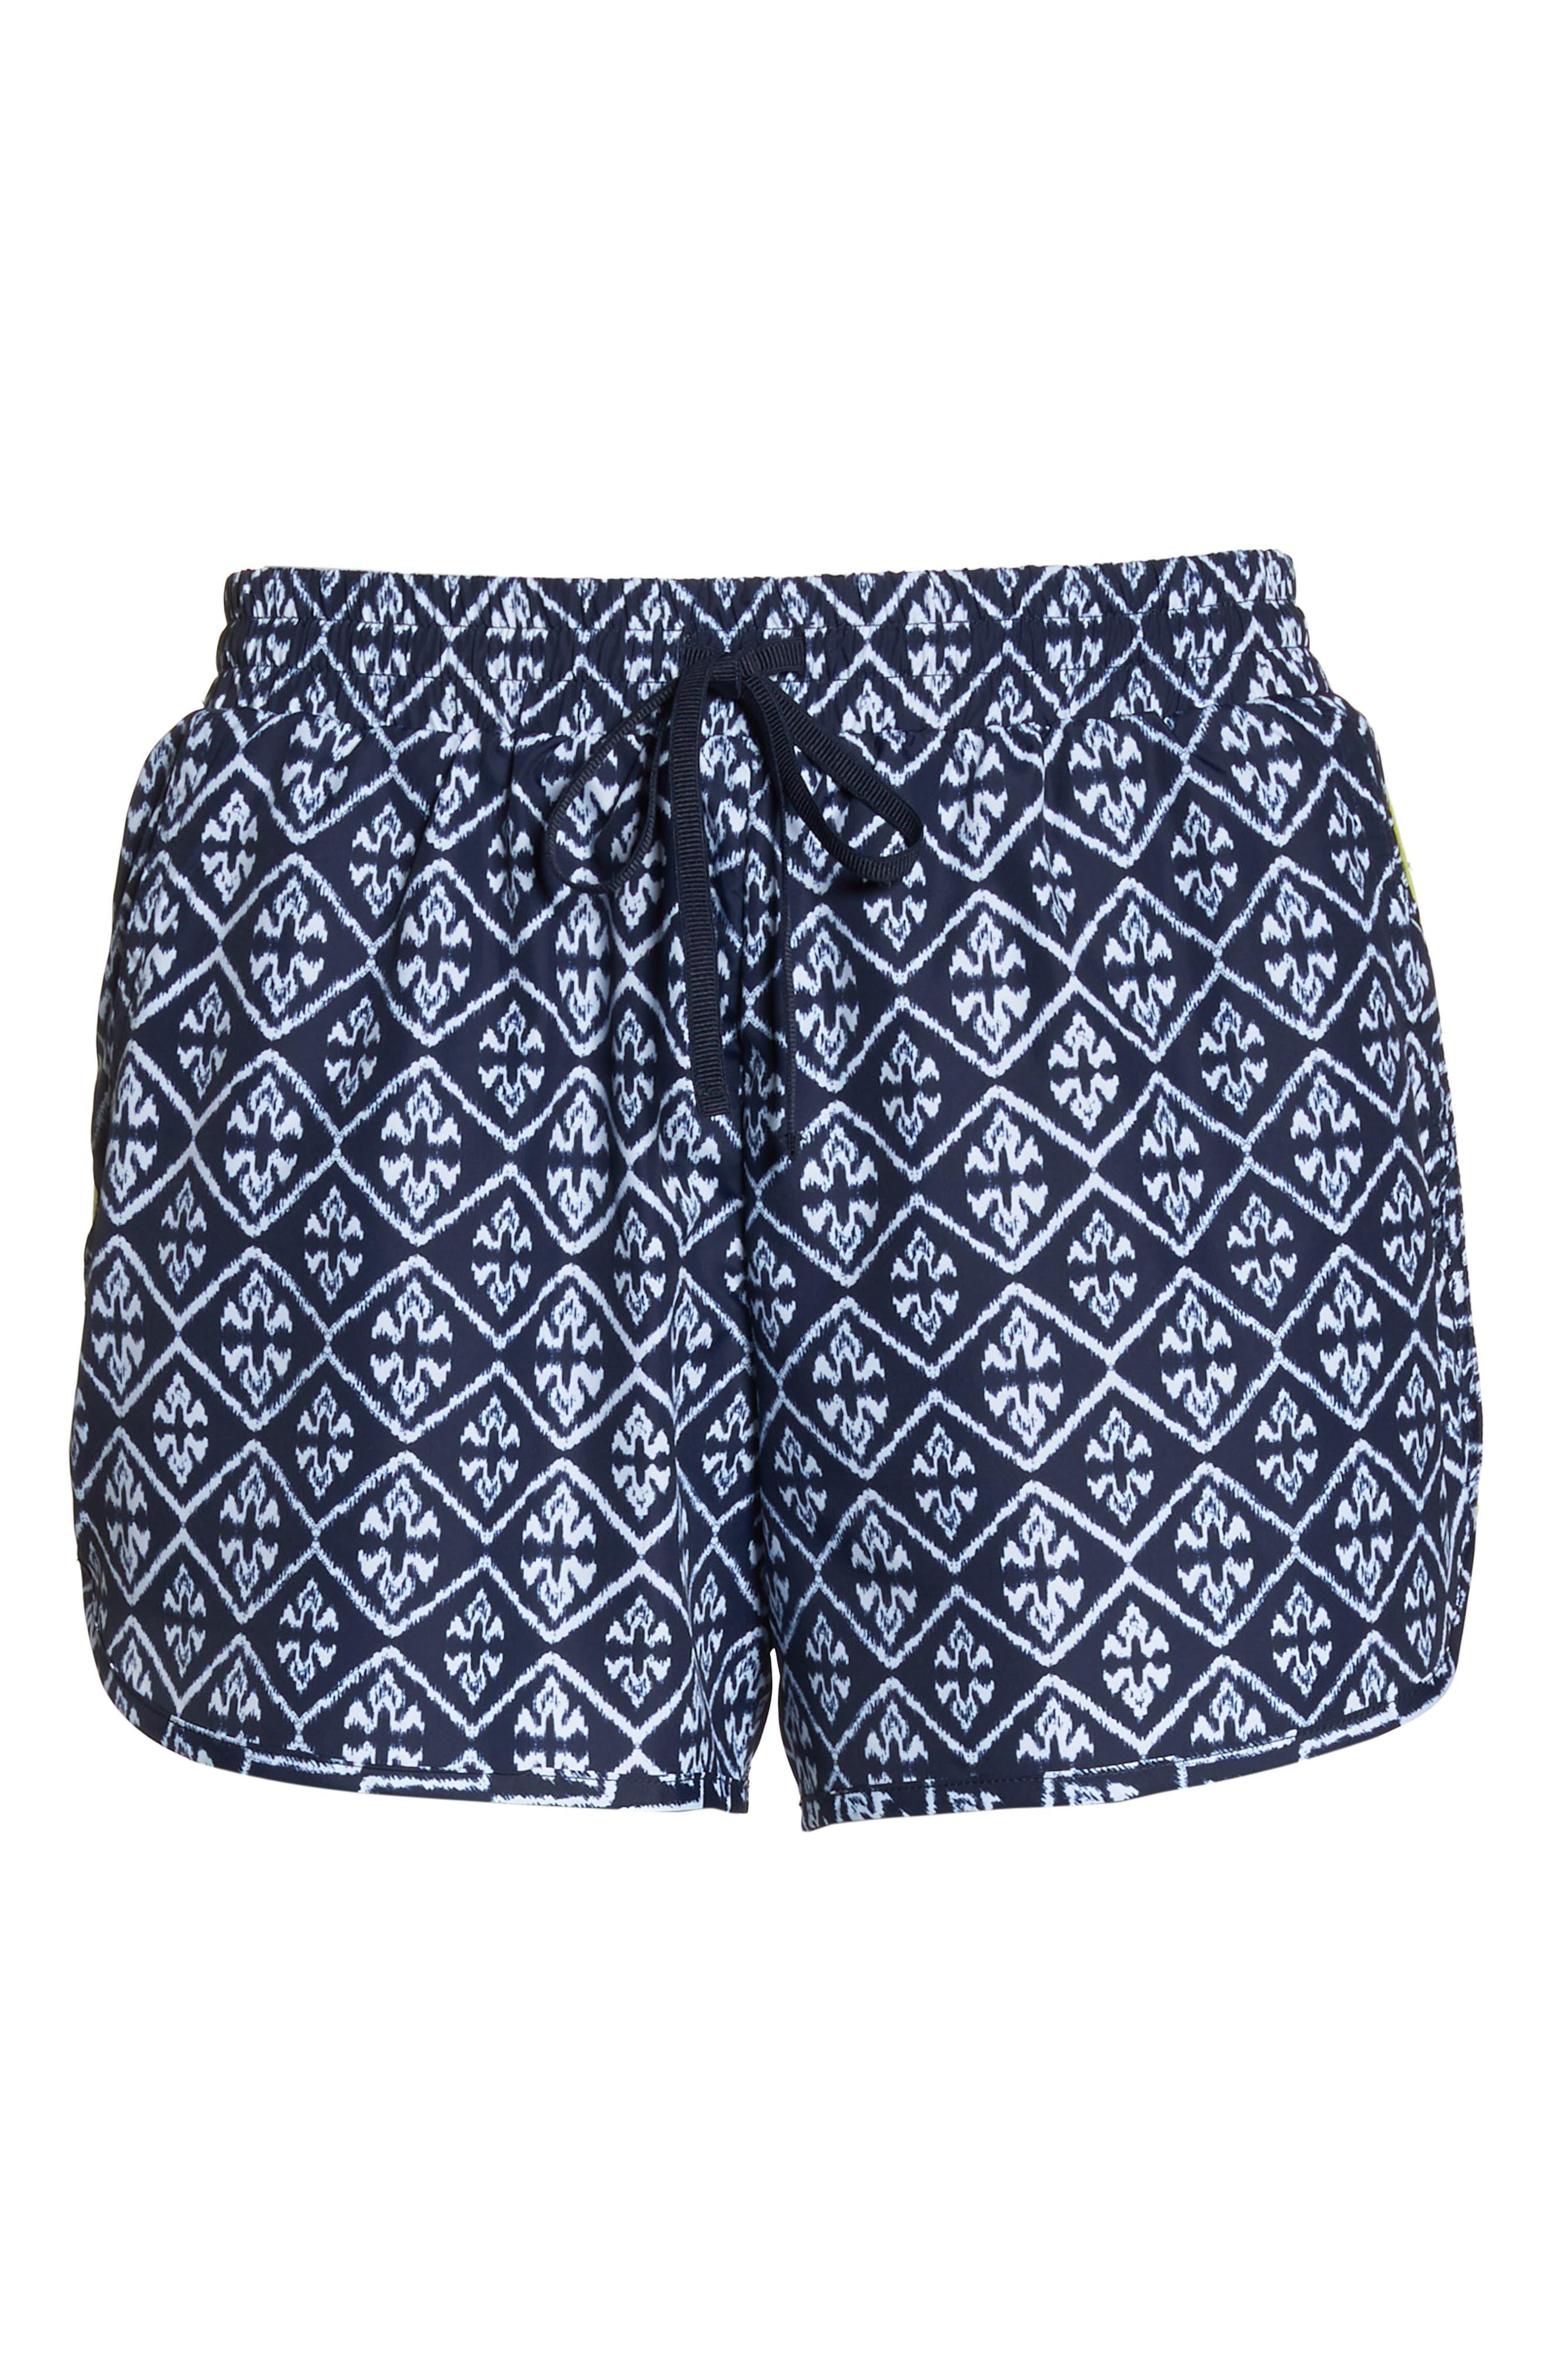 Ikat Neon Running Shorts,                             Alternate thumbnail 7, color,                             INDIGO/ WHITE